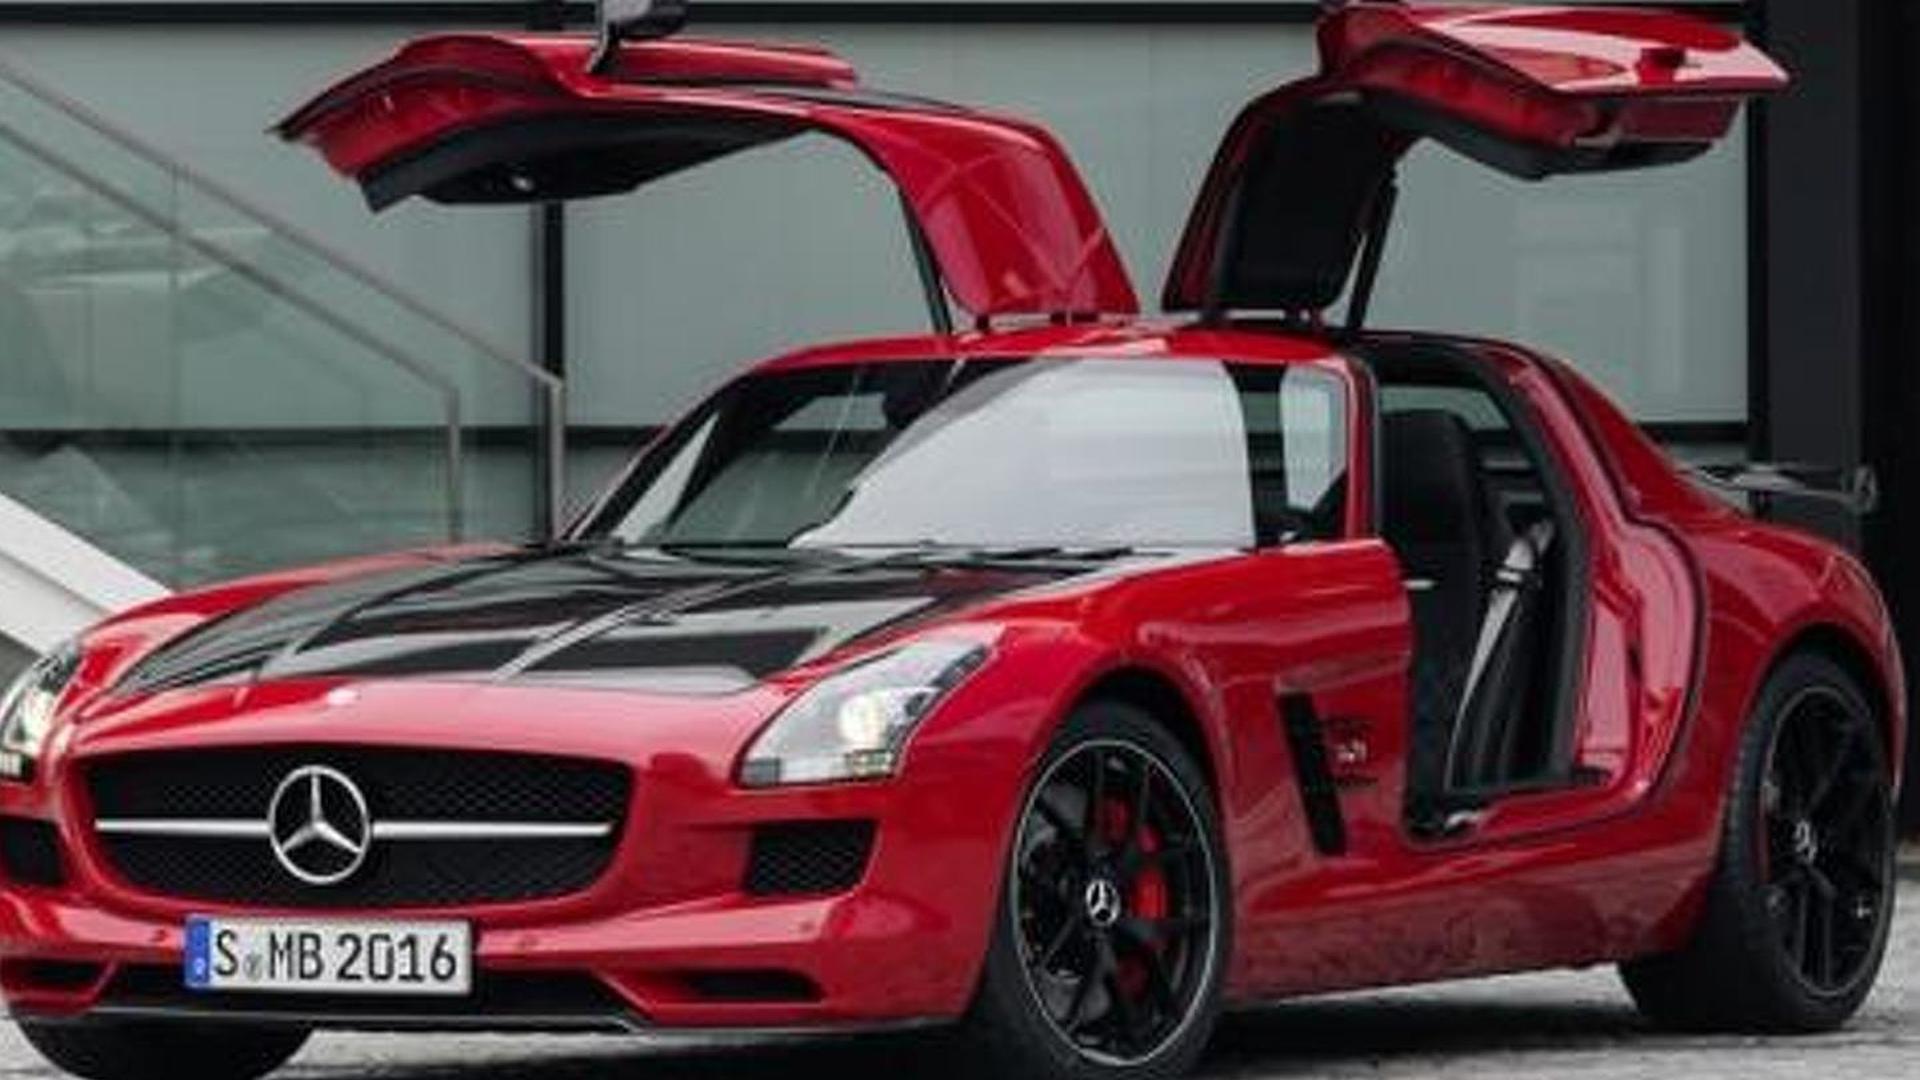 2014 mercedes benz sls amg gt final edition breaks cover for Mercedes benz sls gt amg